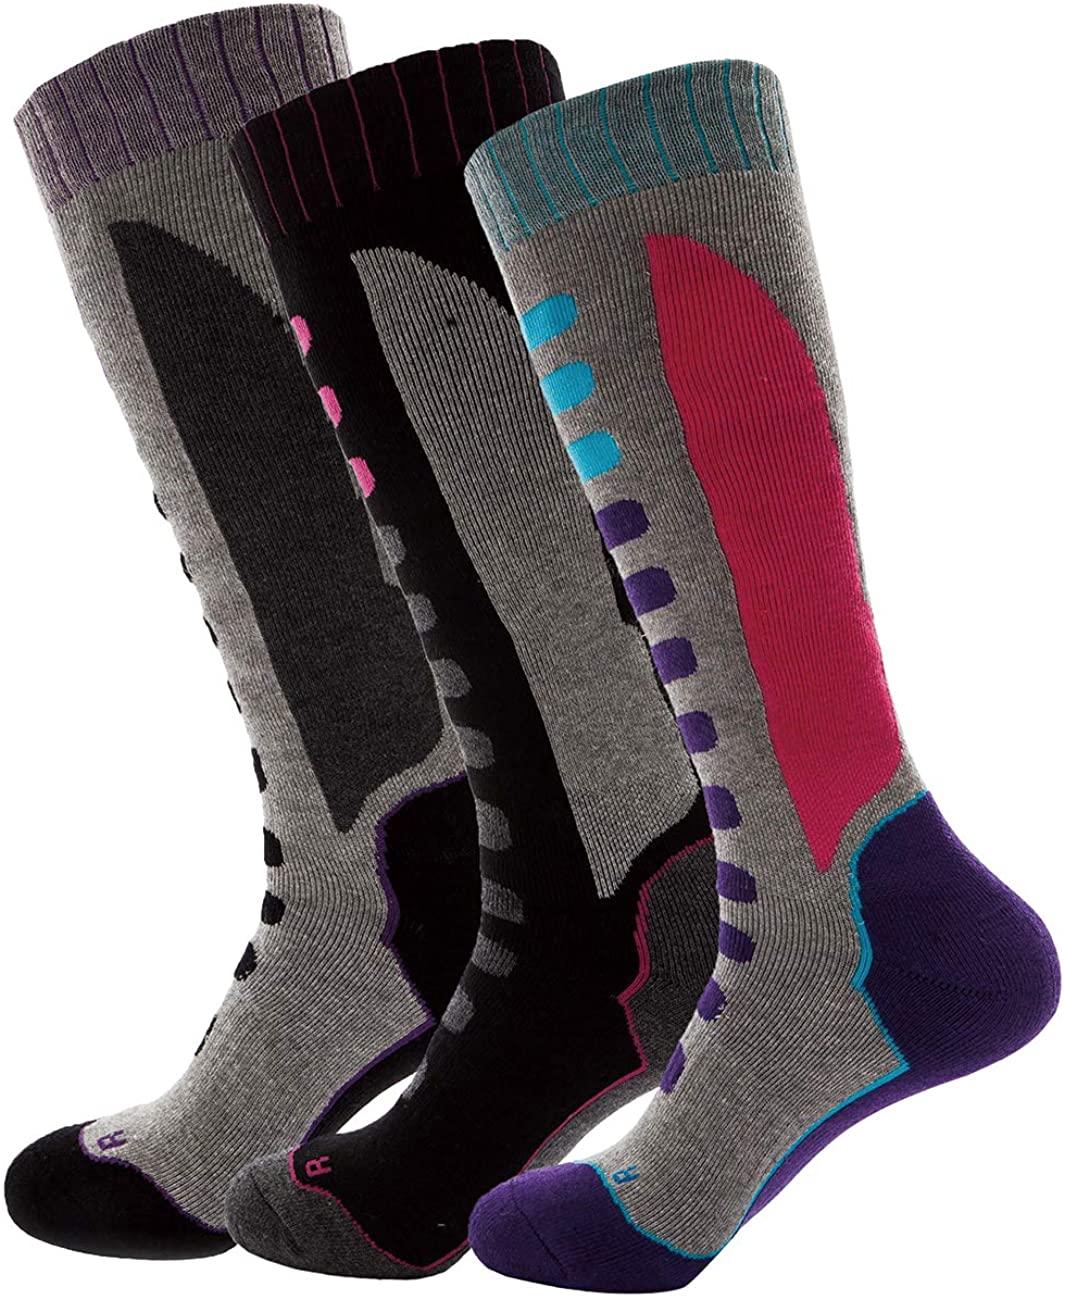 Wantdo Women's Winter Snowboard Socks Full Cushion Moisture-wicking Ski Socks